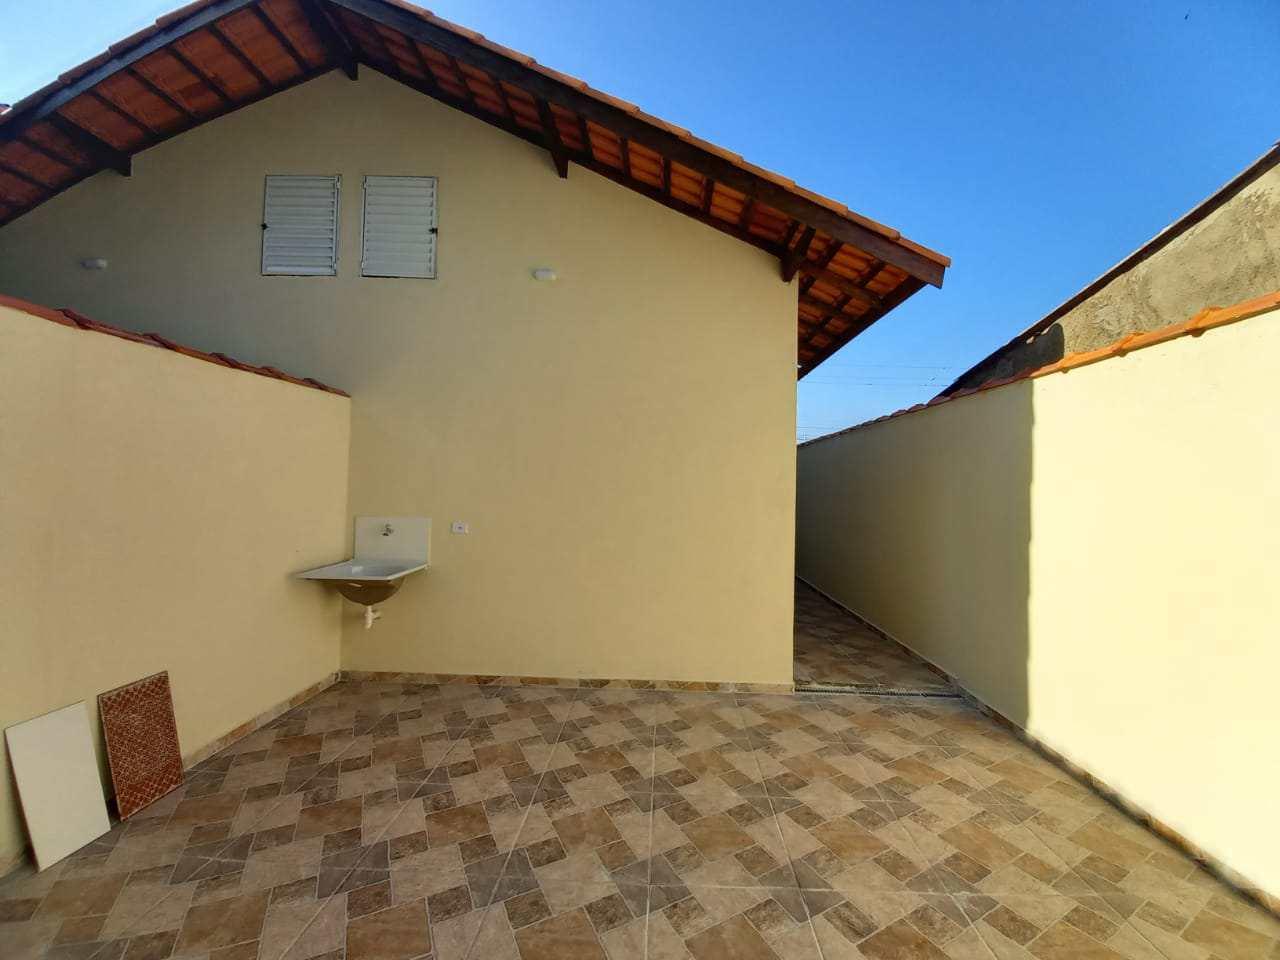 Casa com 2 dorms, Jardim Magalhães, Itanhaém - R$ 220 mil, Cod: 5636